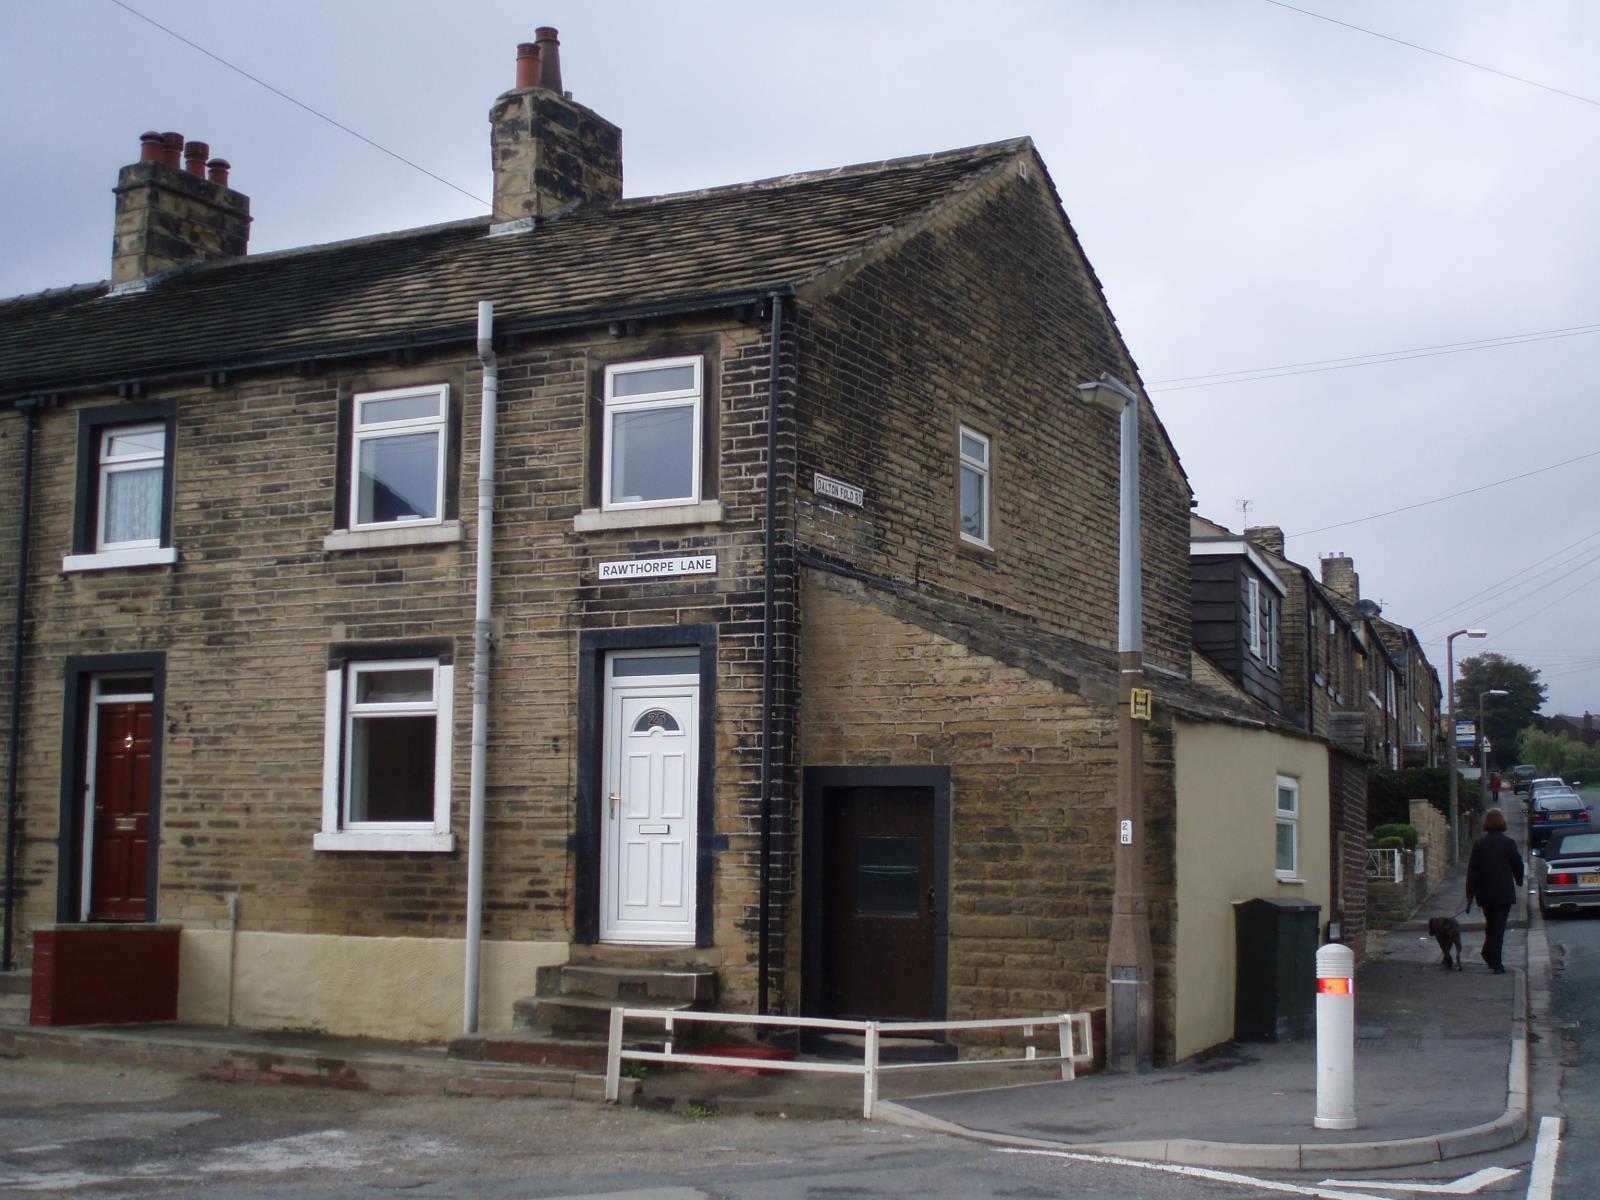 25 Rawthorpe Lane, Dalton, Huddersfield HD5 9NJ